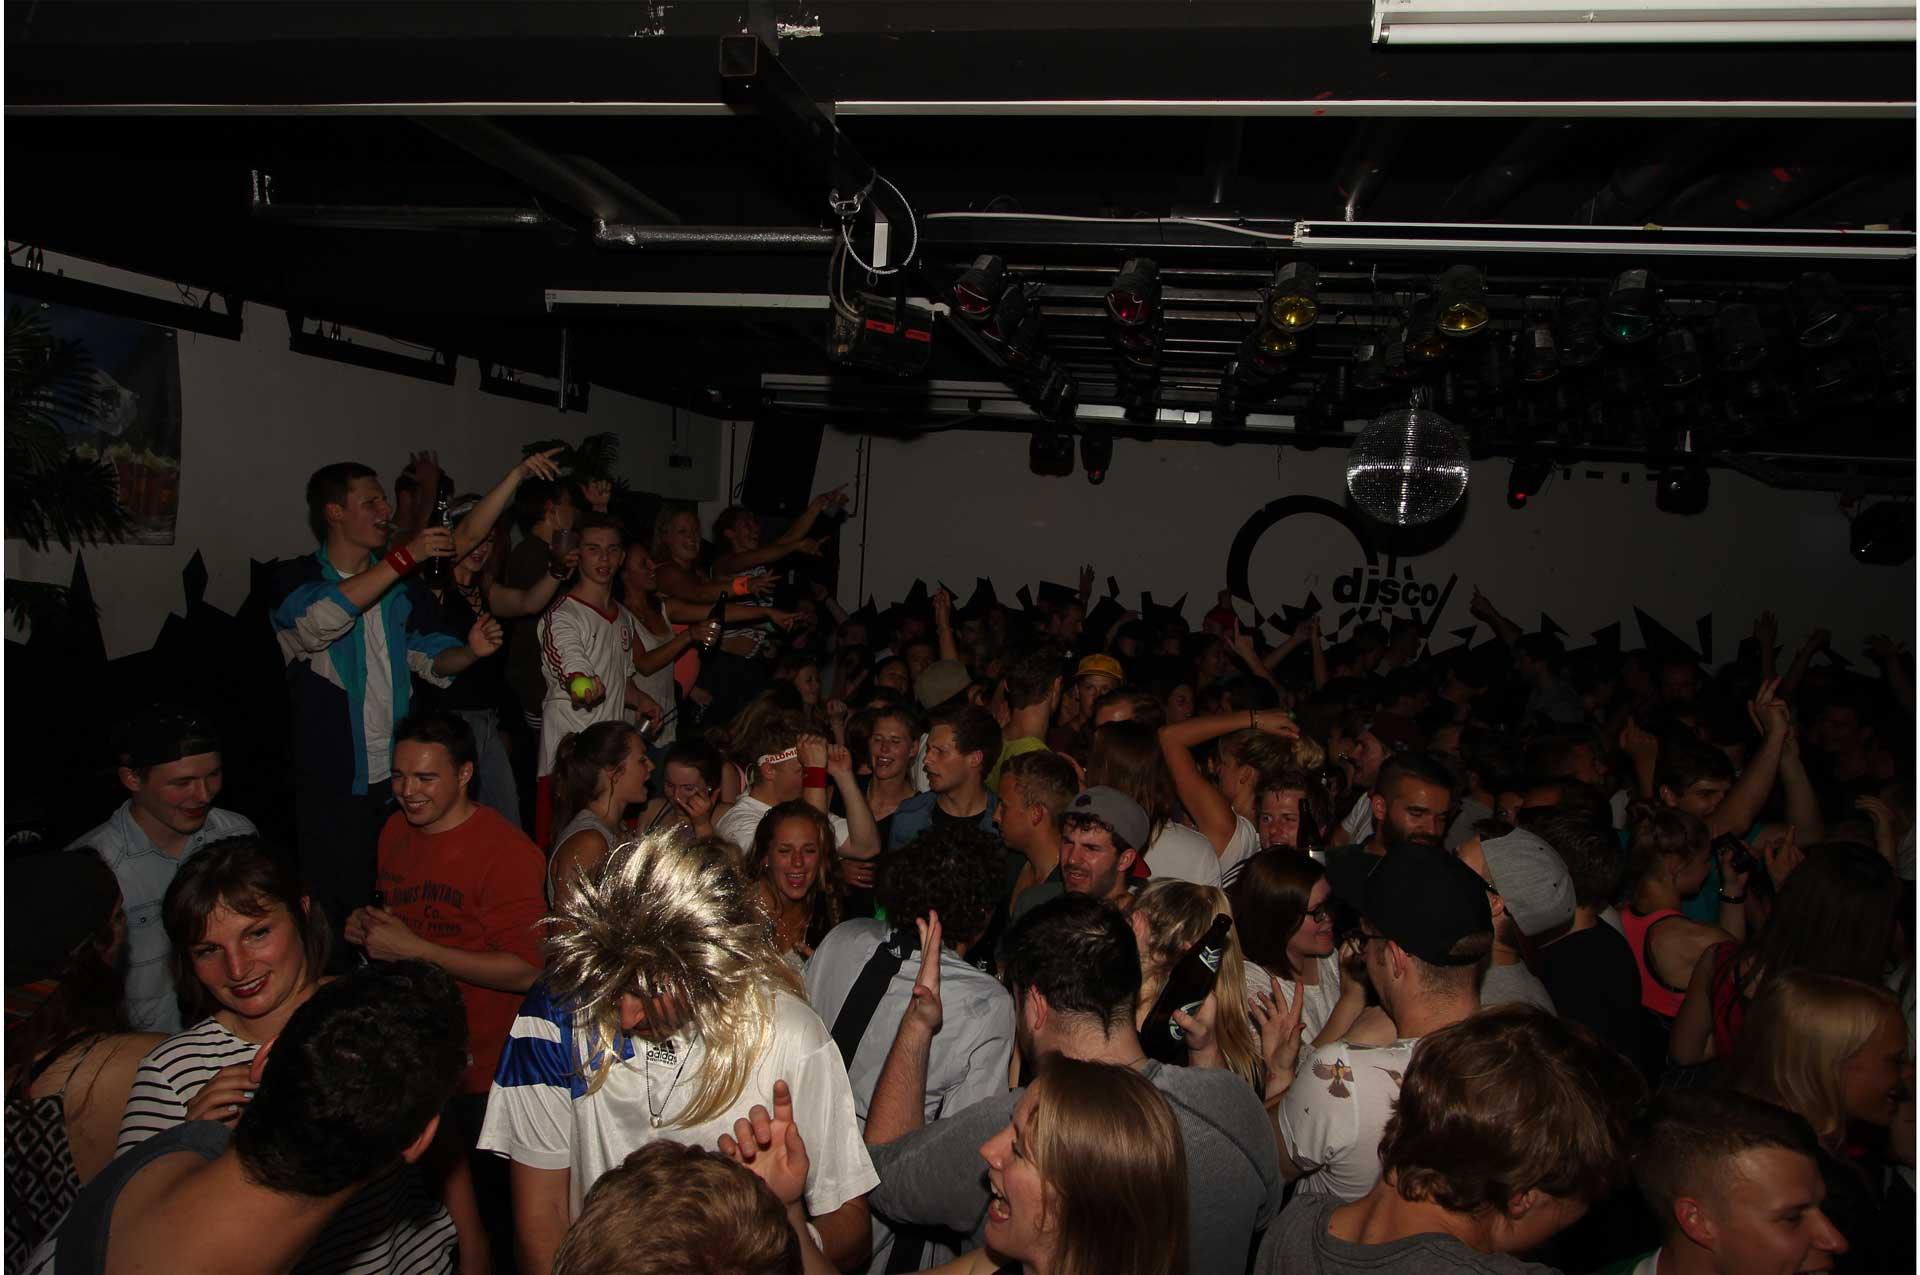 Oly-Disco und Oly-Lounge